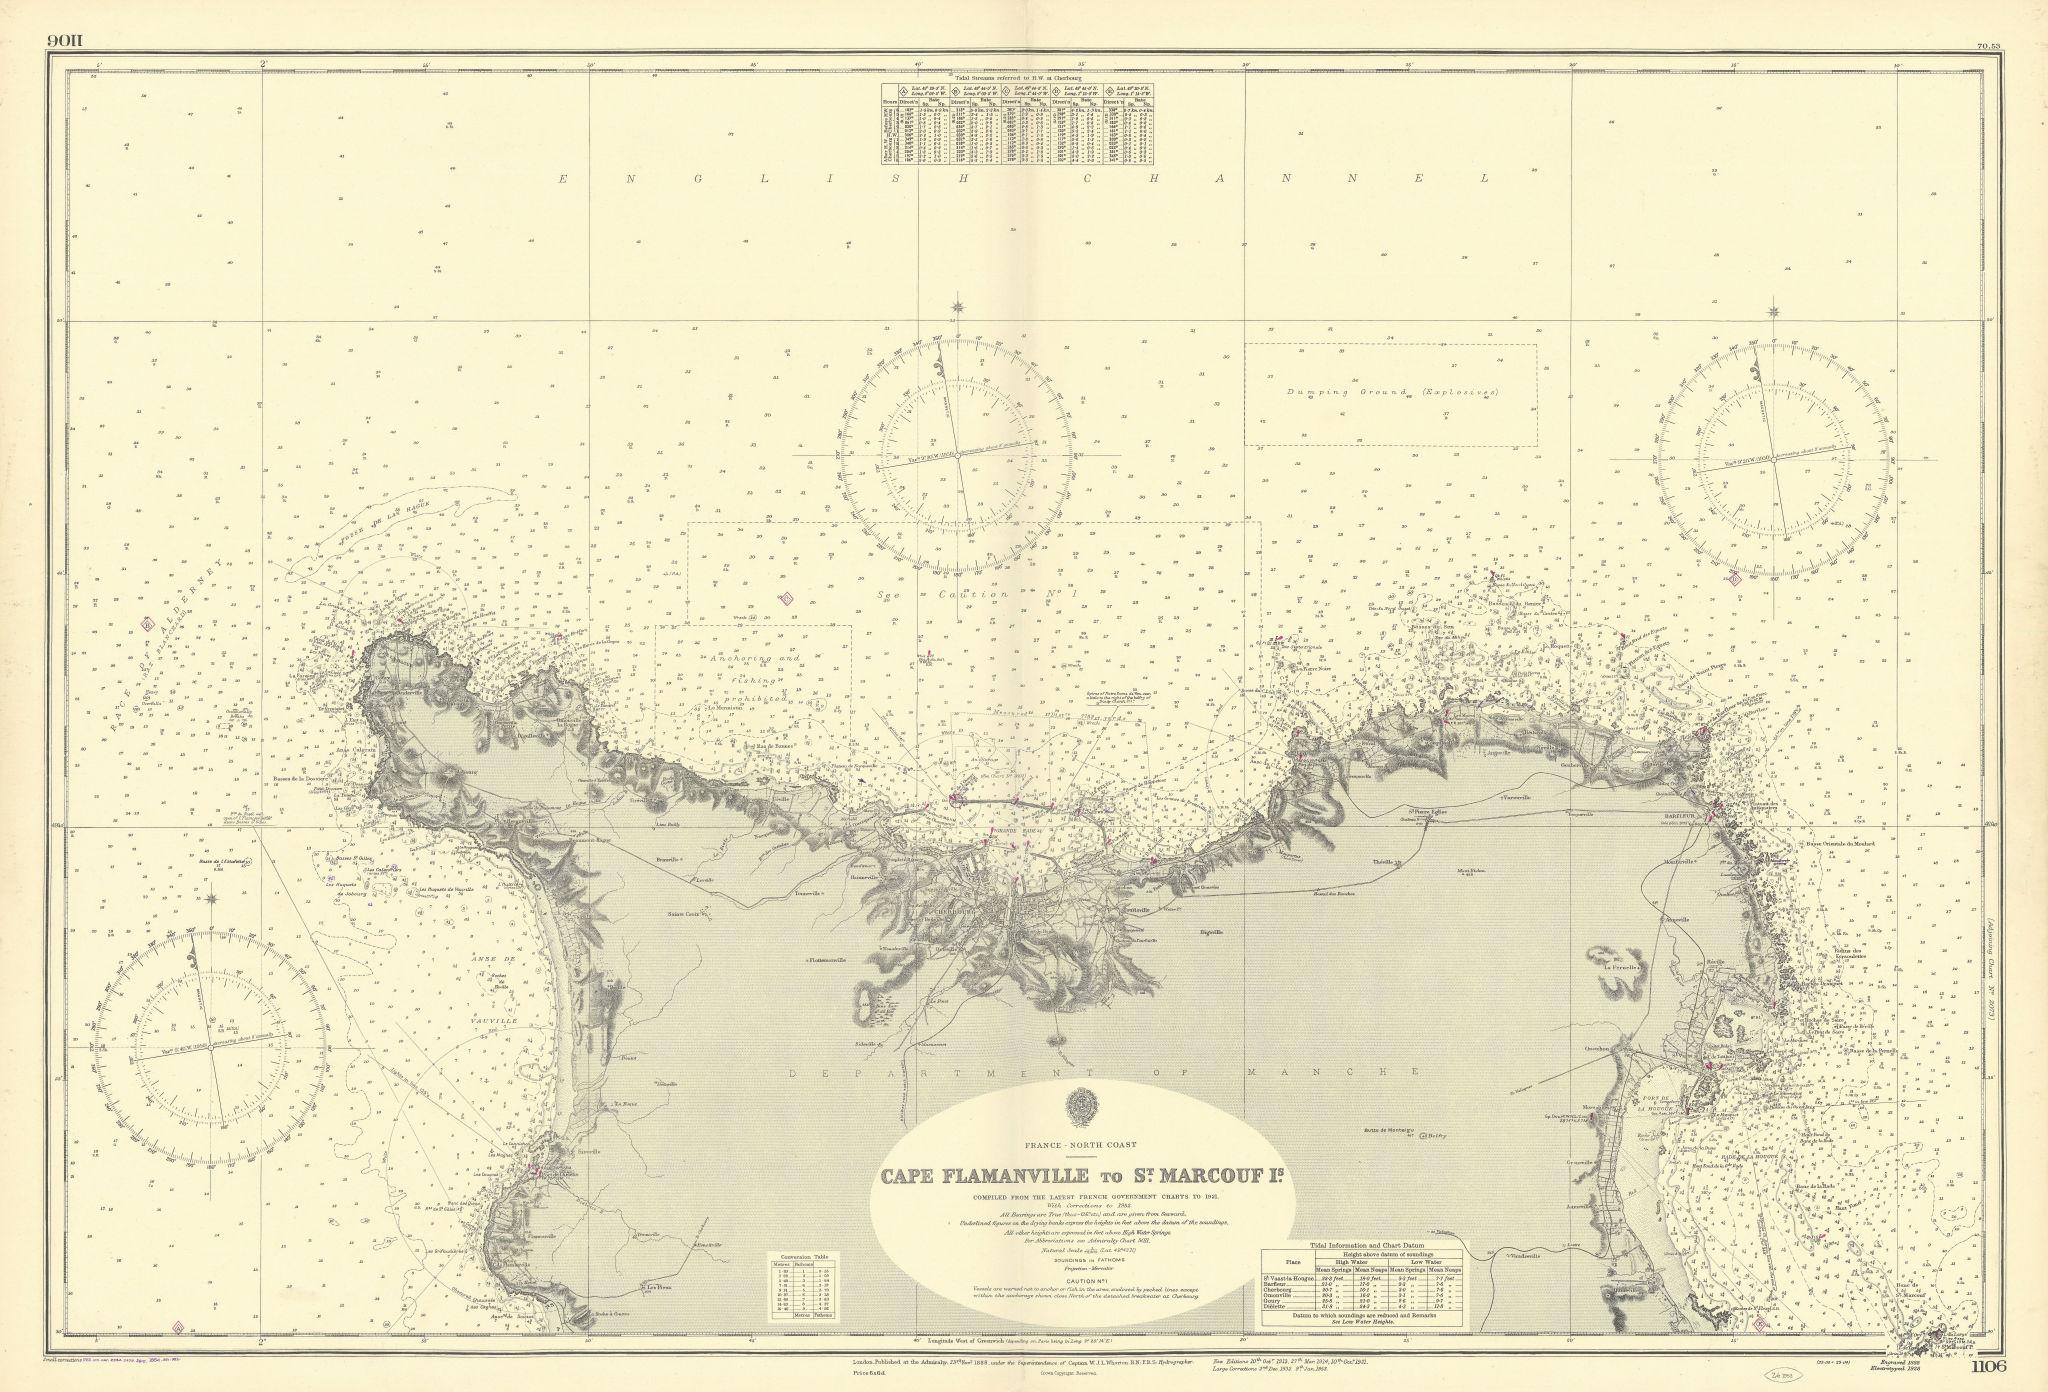 North Cotentin coast. Cherbourg. Manche. ADMIRALTY sea chart 1888 (1954) map